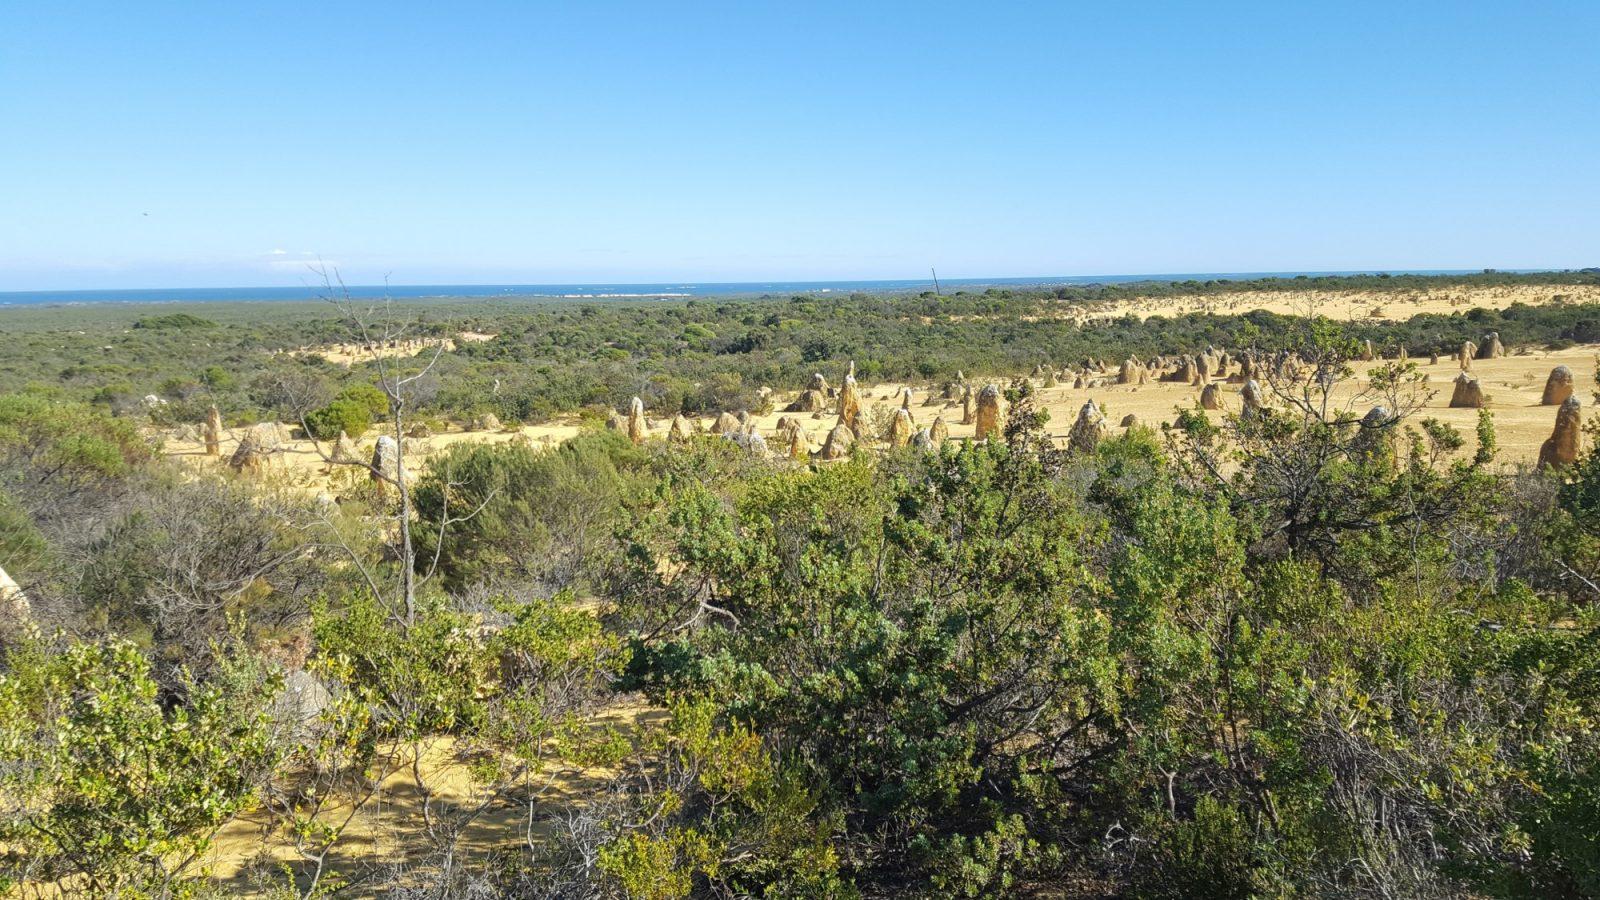 Nambung panorama